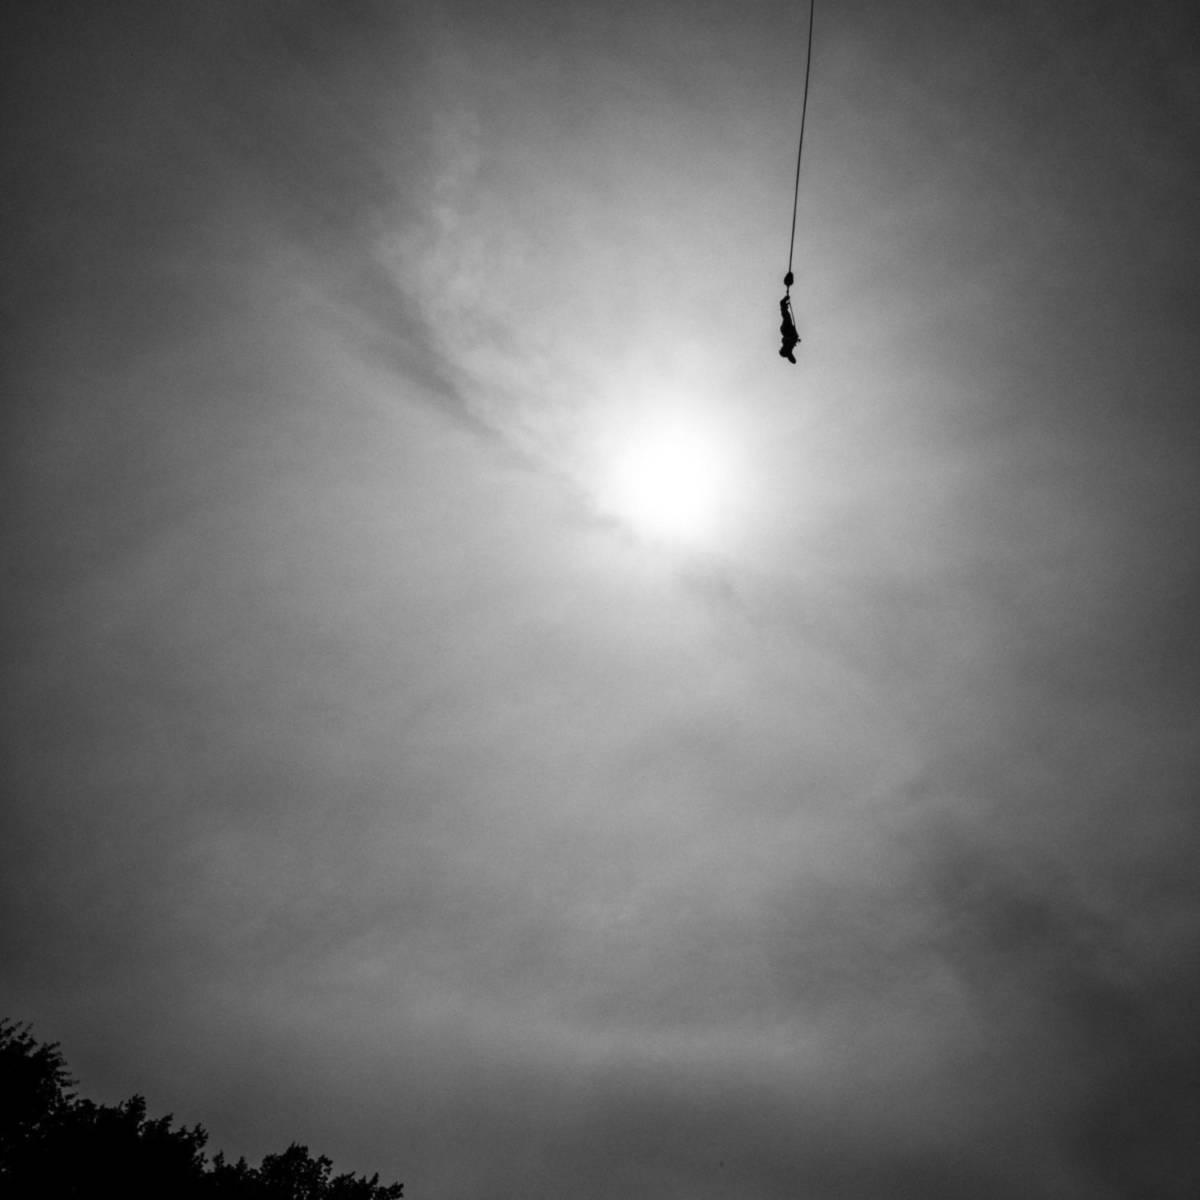 Bungee Jumping - Berlin LQ